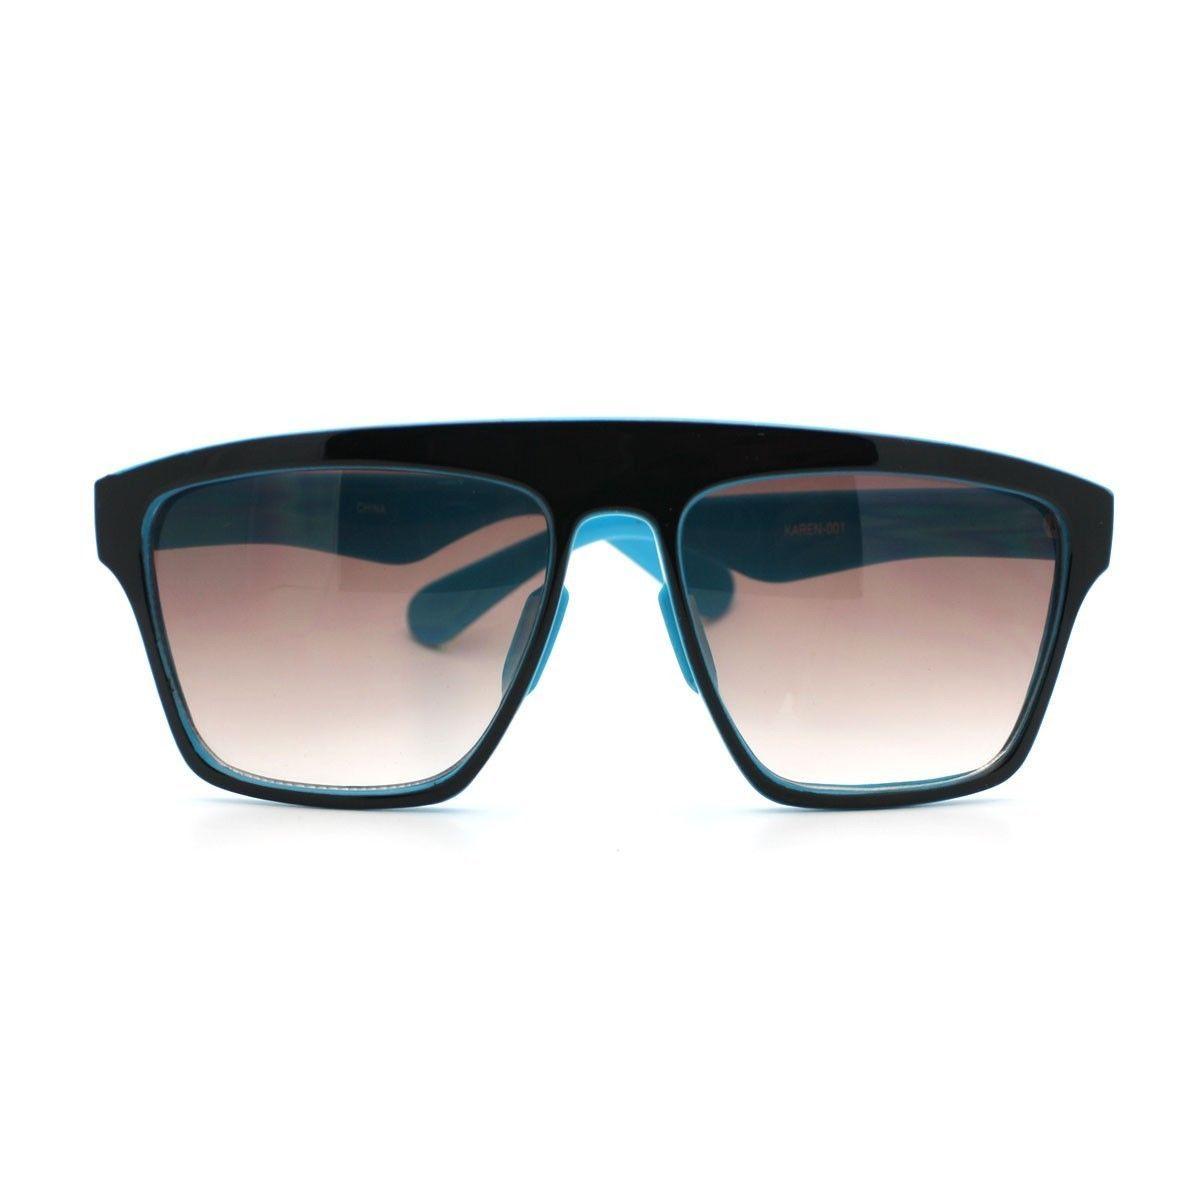 New Unisex Sunglasses Square Arched Top Robot Frame 2-Tone BLACK BLUE